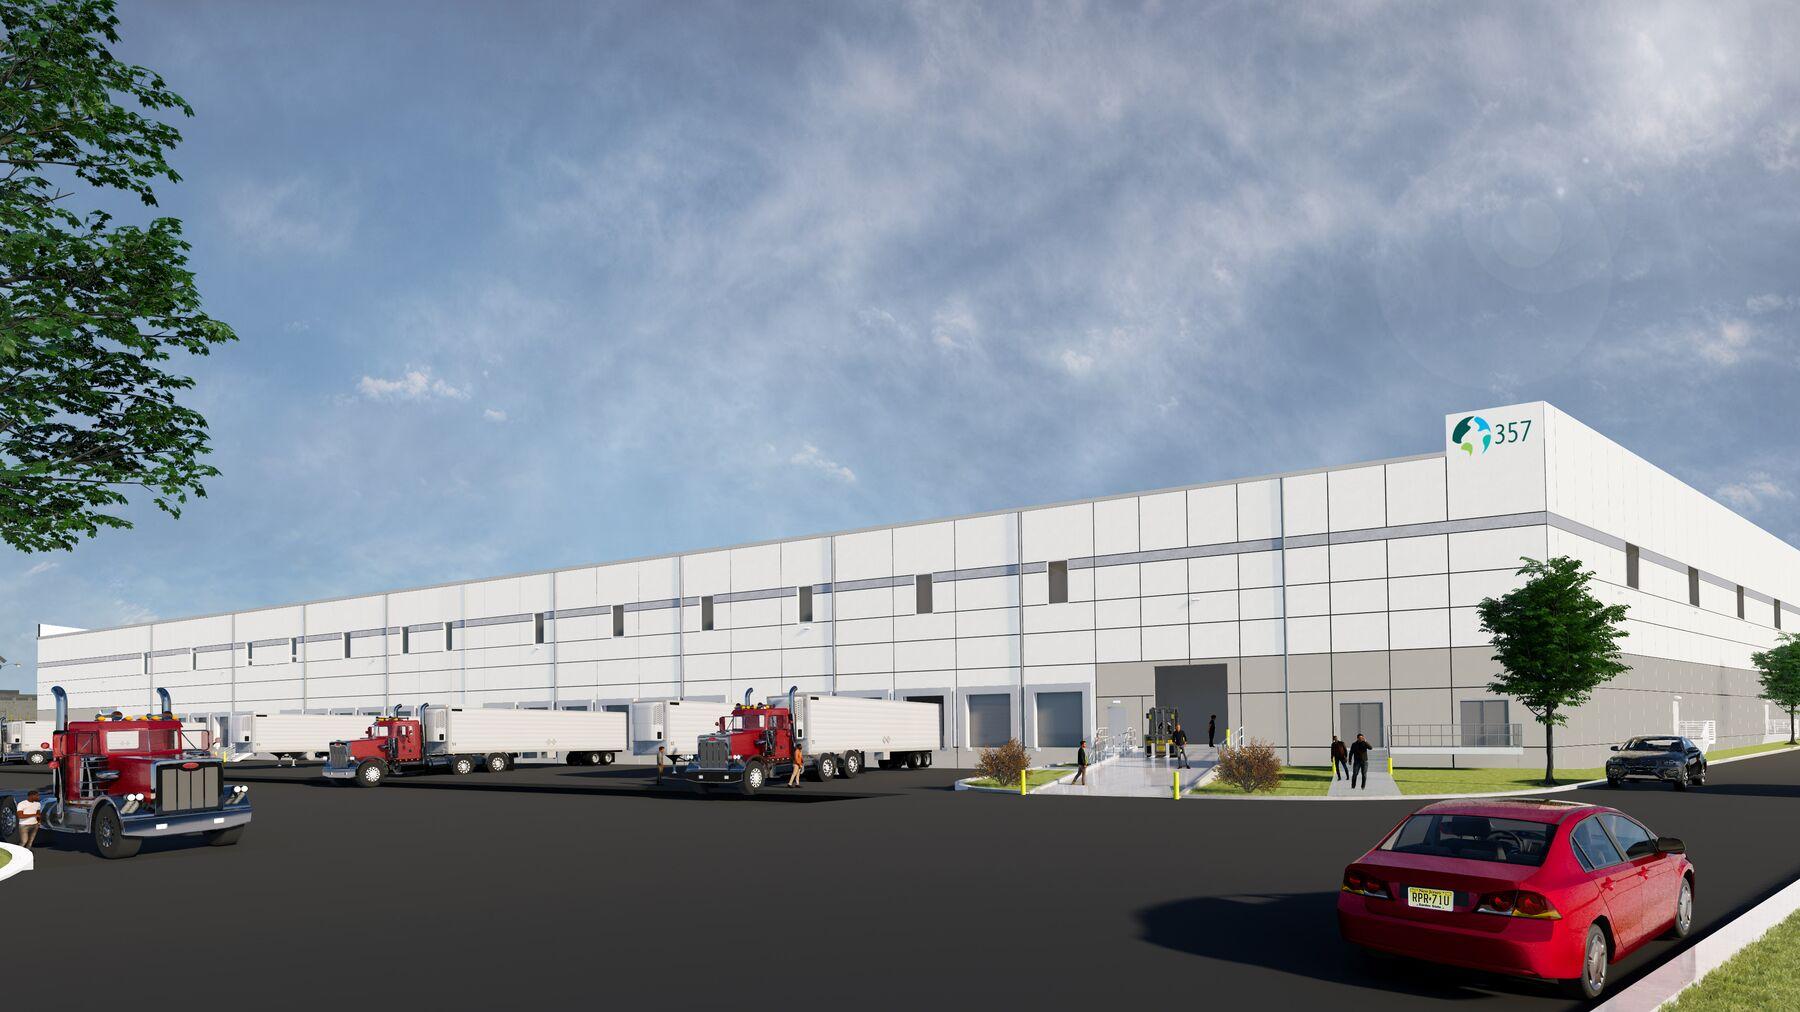 DPM-Prologis-Ports-Newark_357-Wilson-Avenue.jpg